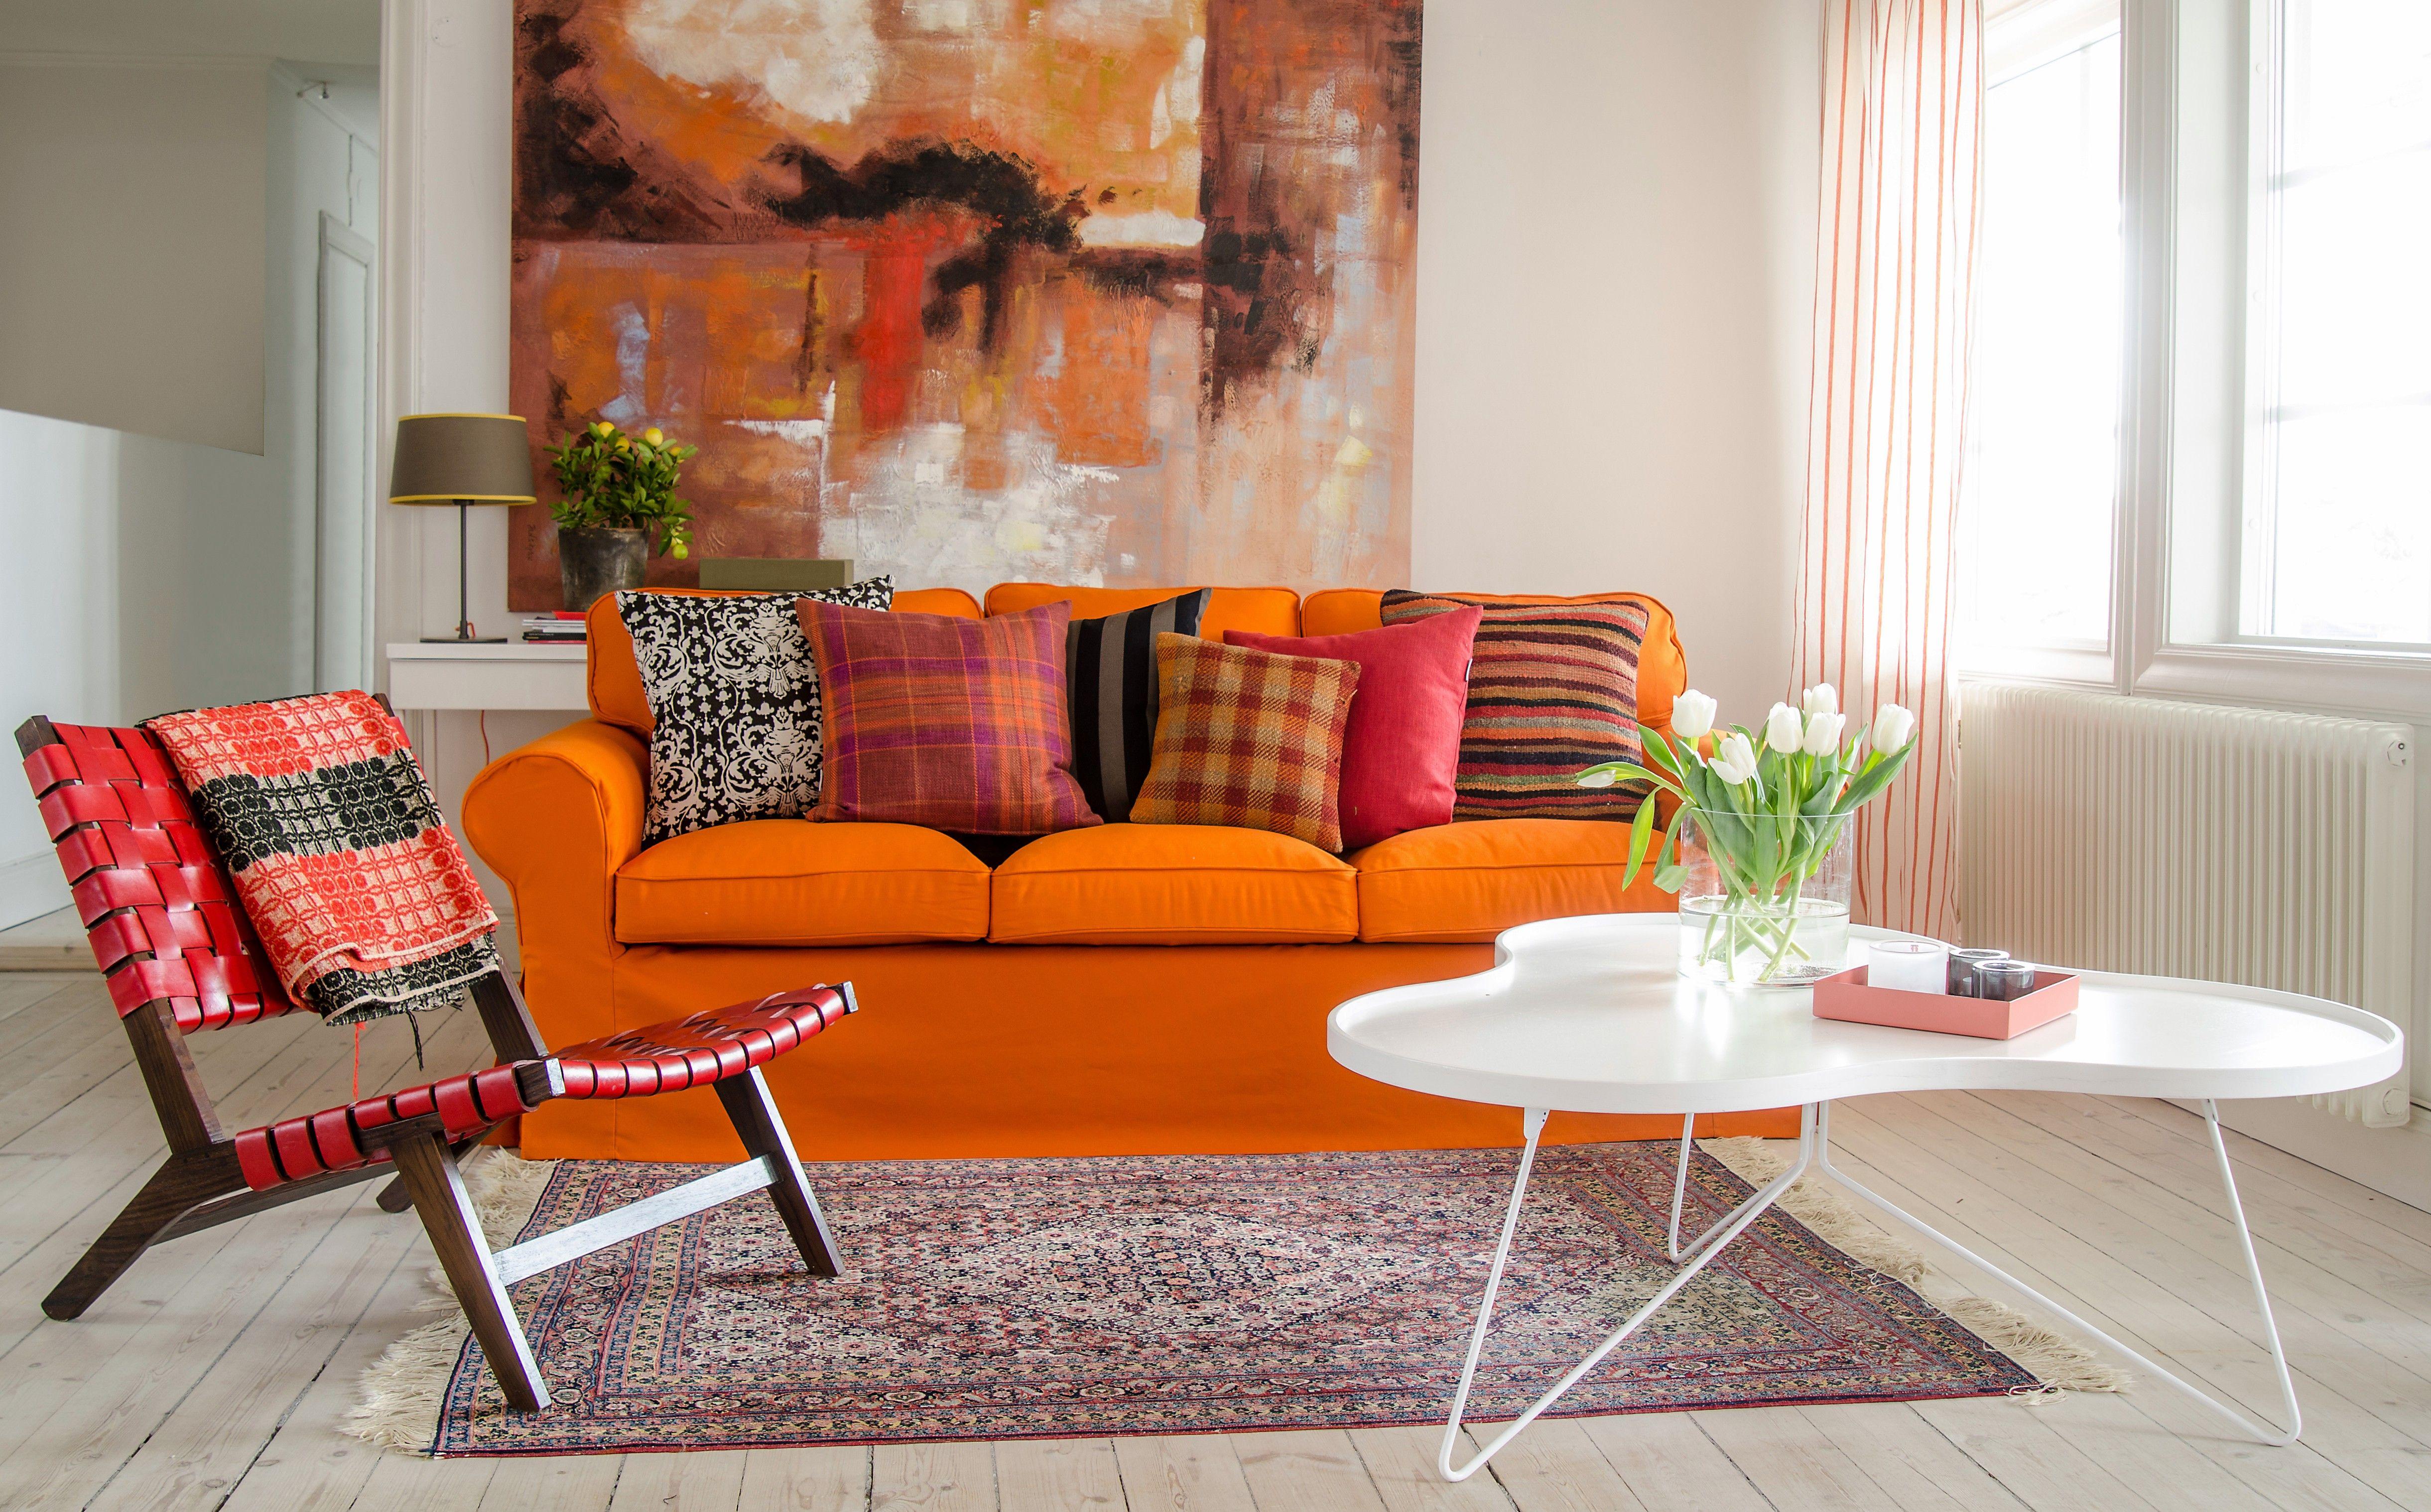 Ektorp 3 seater sofa cover fabric Mandarin Orange Panama Cotton